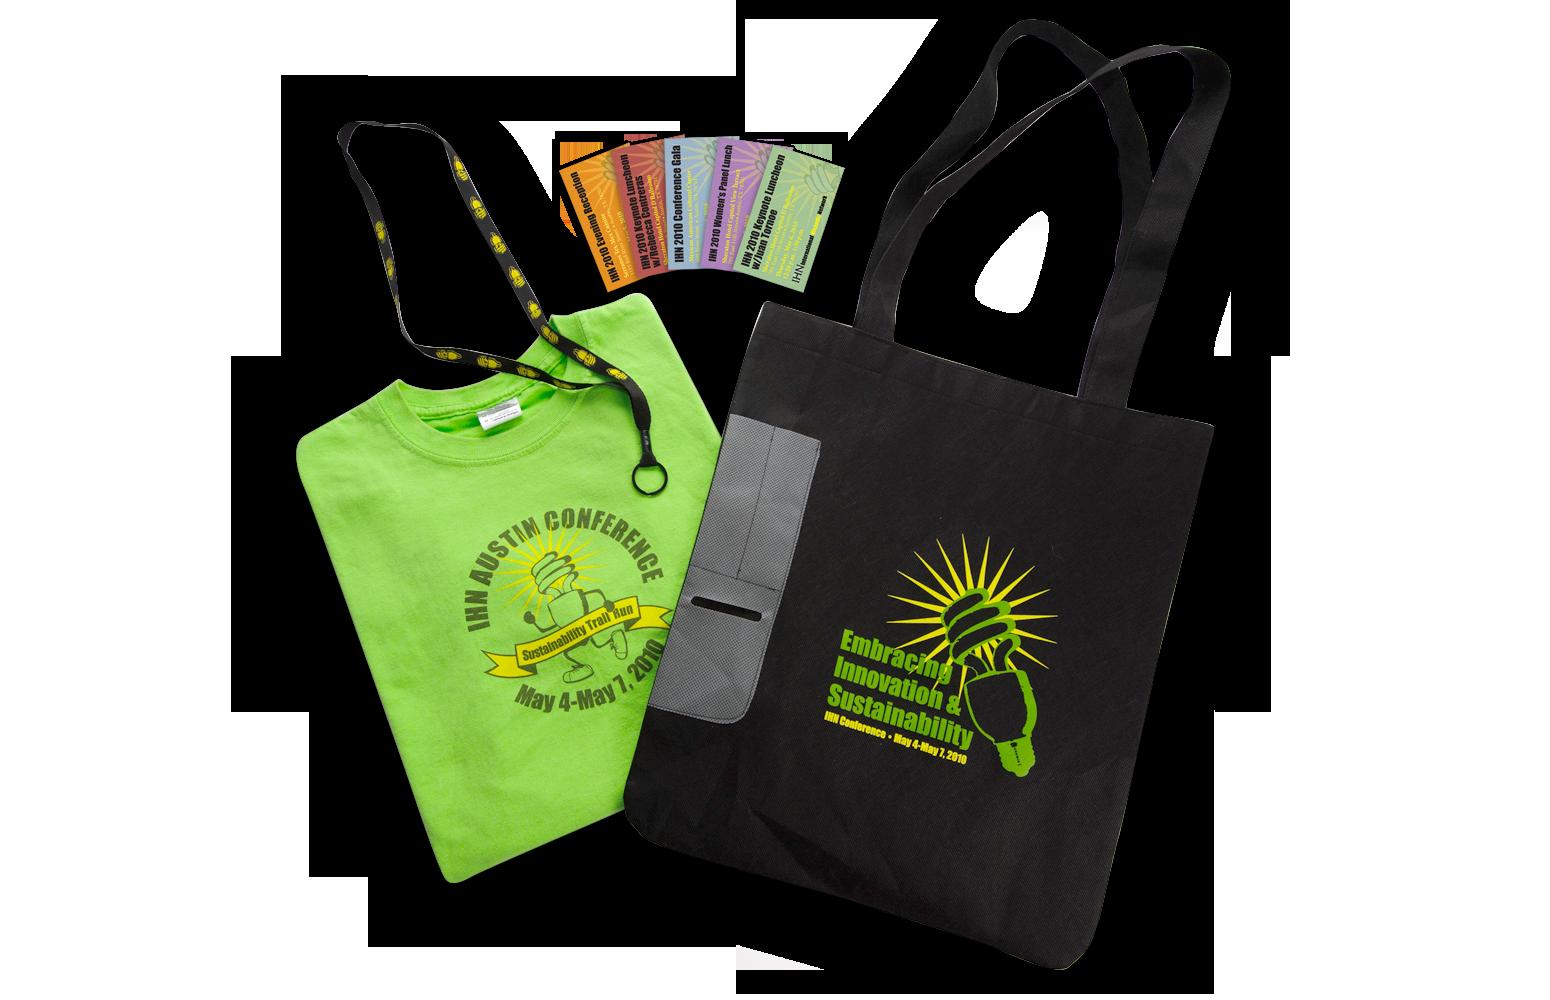 IHN 2010 Conference Merchandise